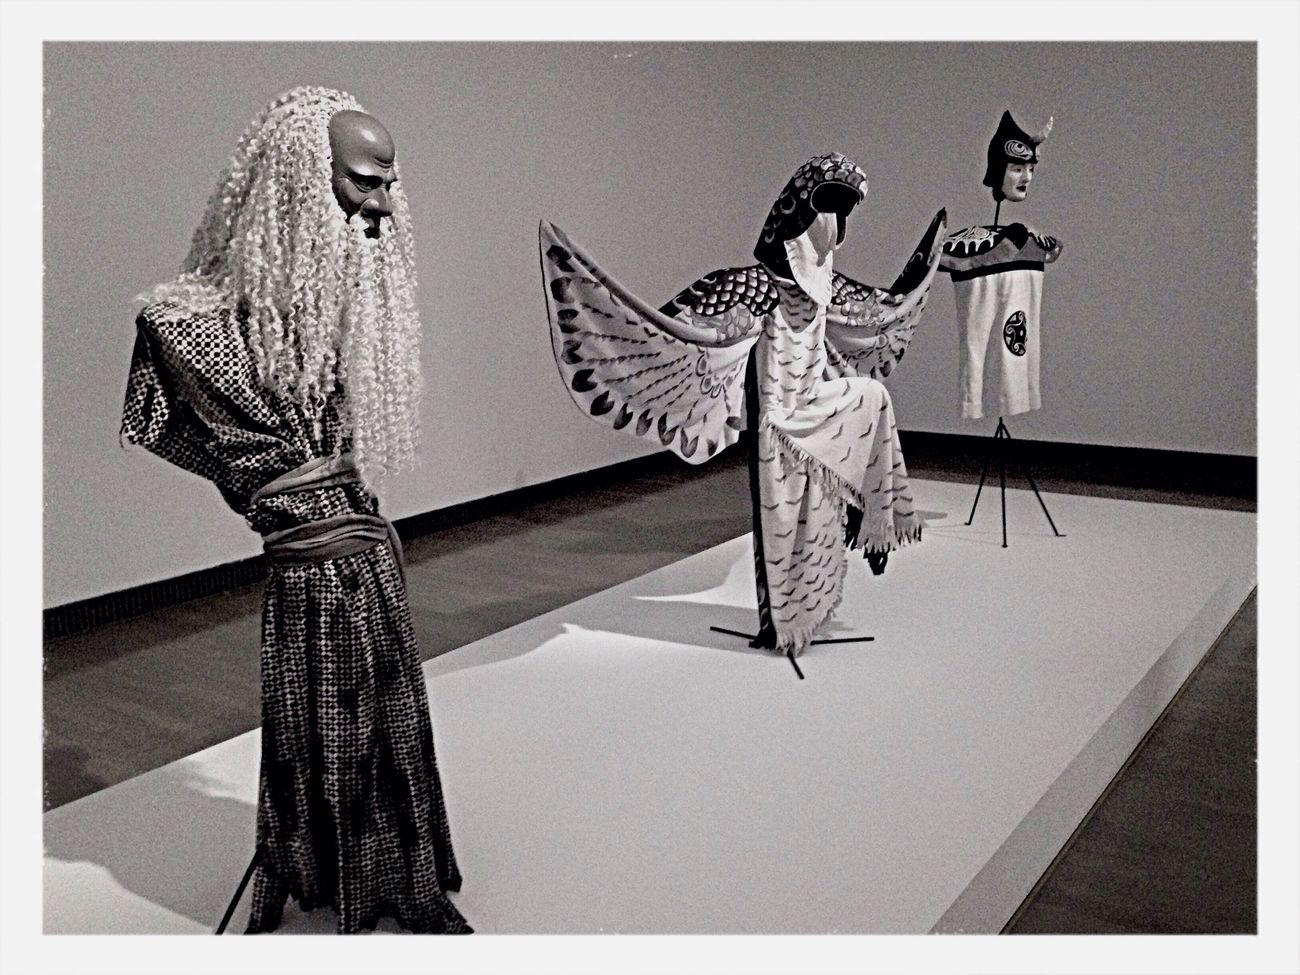 Art Black And White Monochrome Musium Of Art